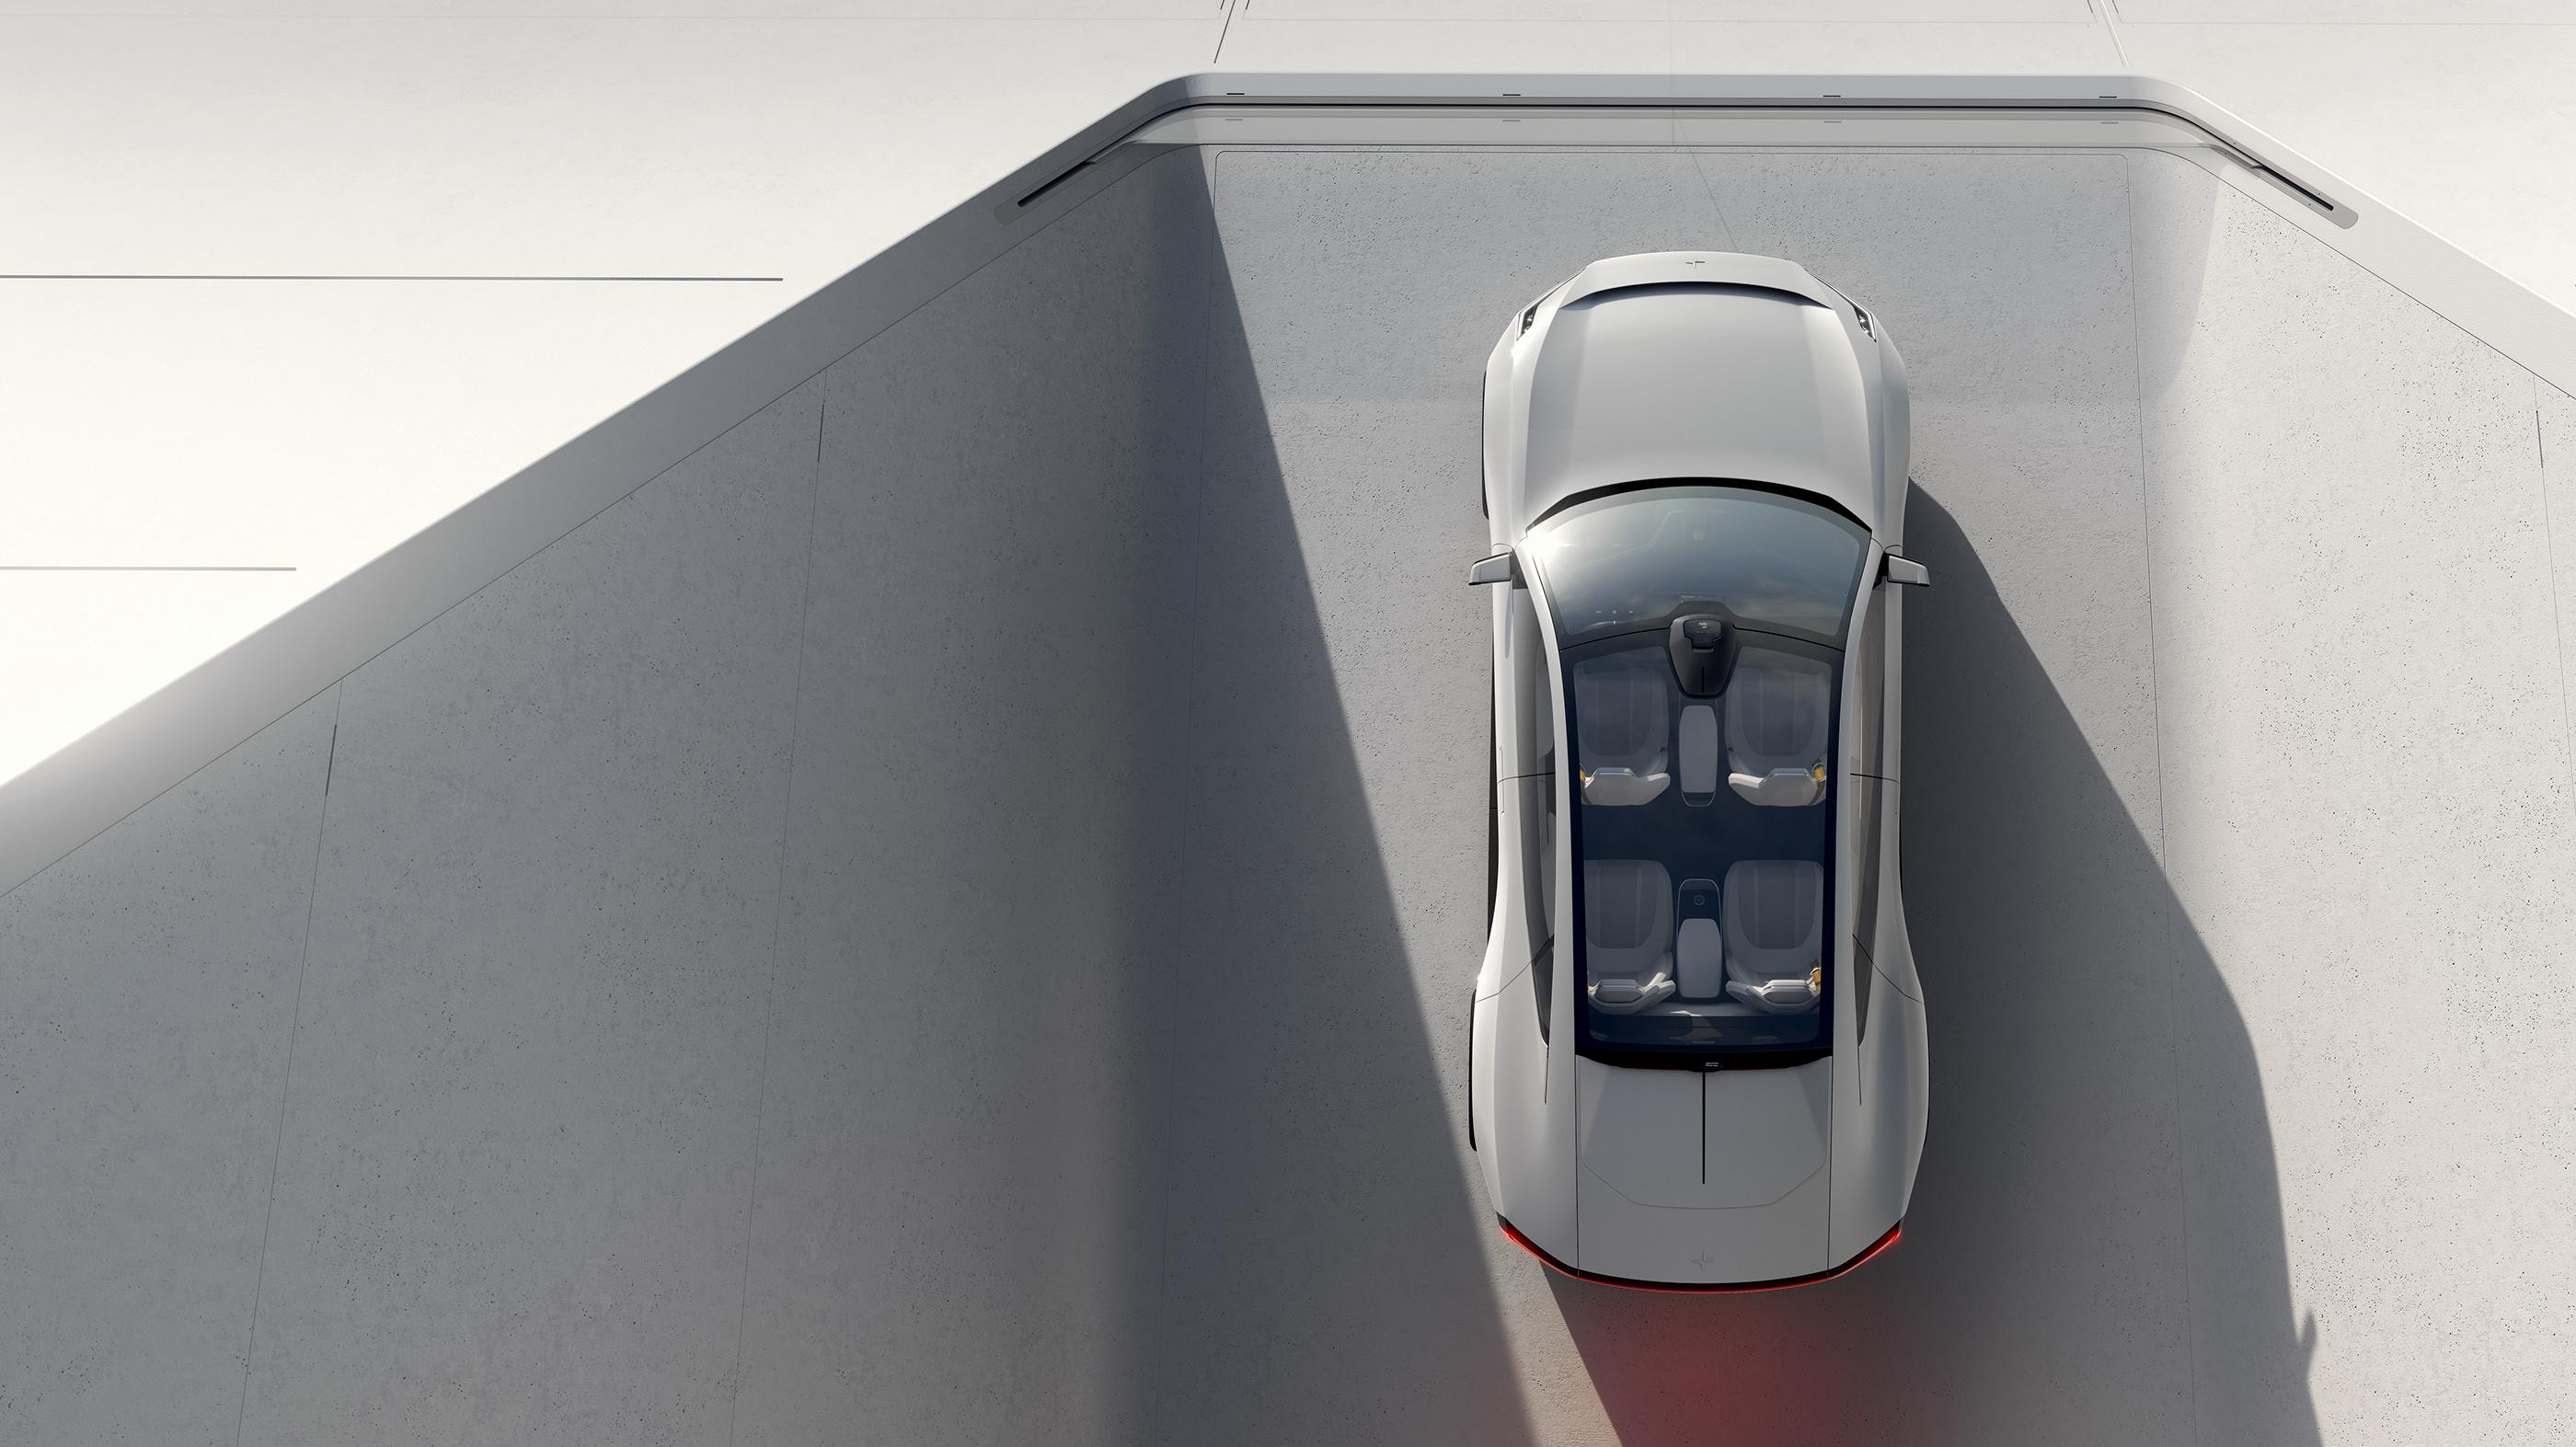 The Amazing Polestar Precept Concept Car